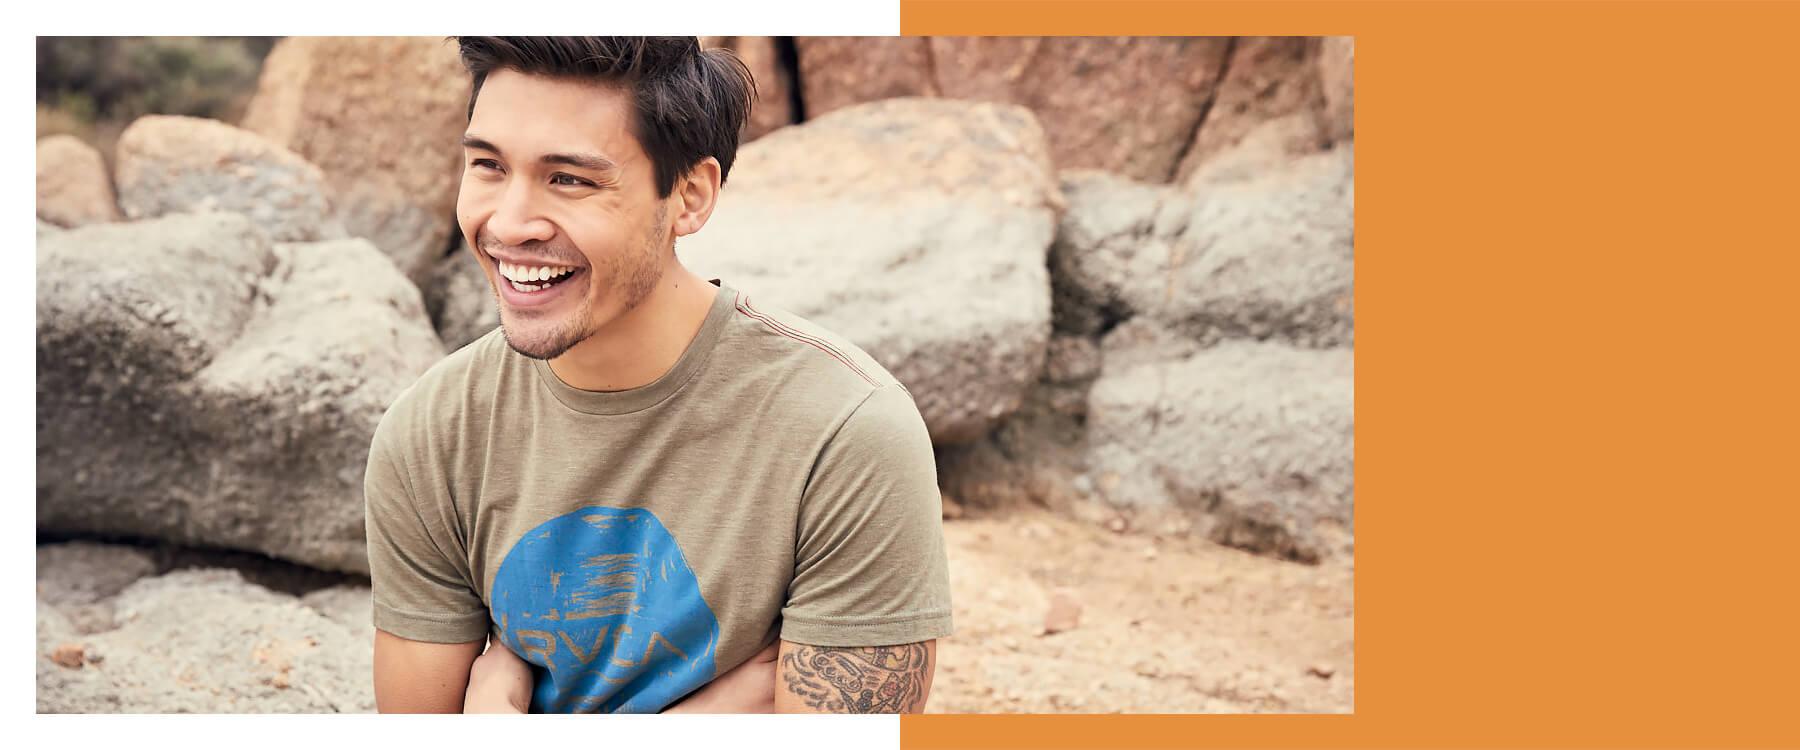 Man wearing a khaki RVCA short sleeve t-shirt